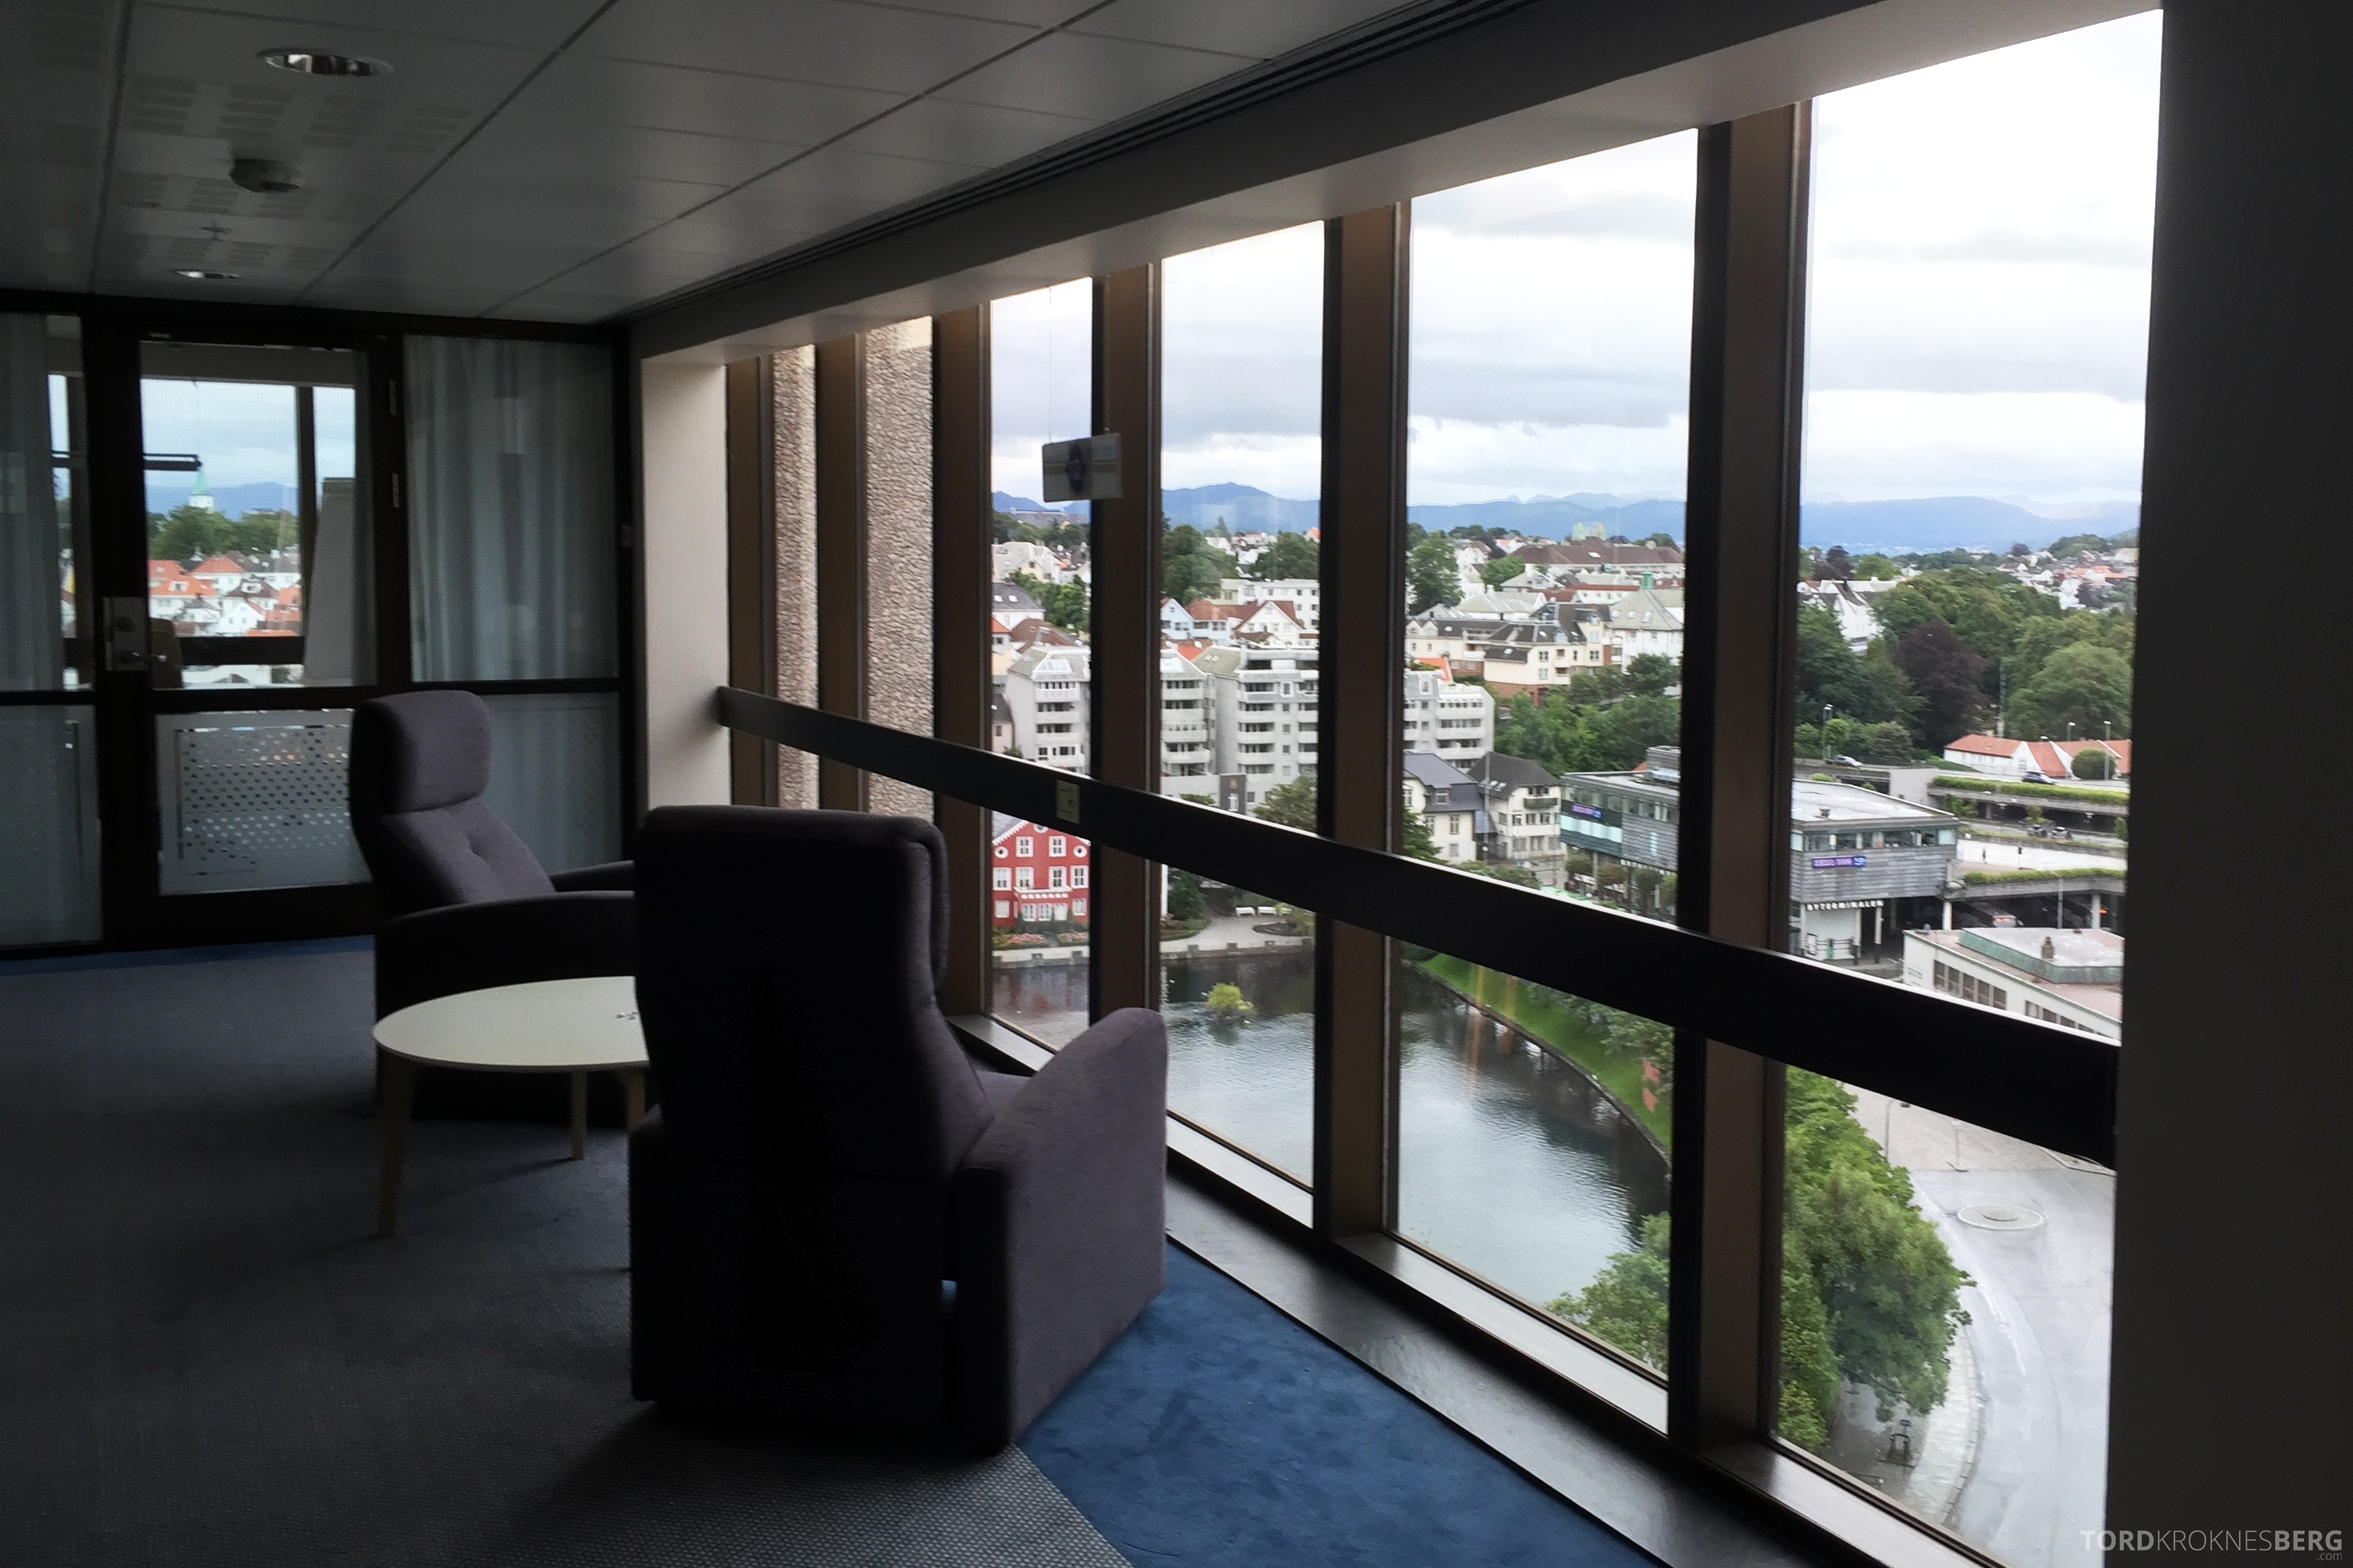 Radisson Blu Atlantic Stavanger business class floor